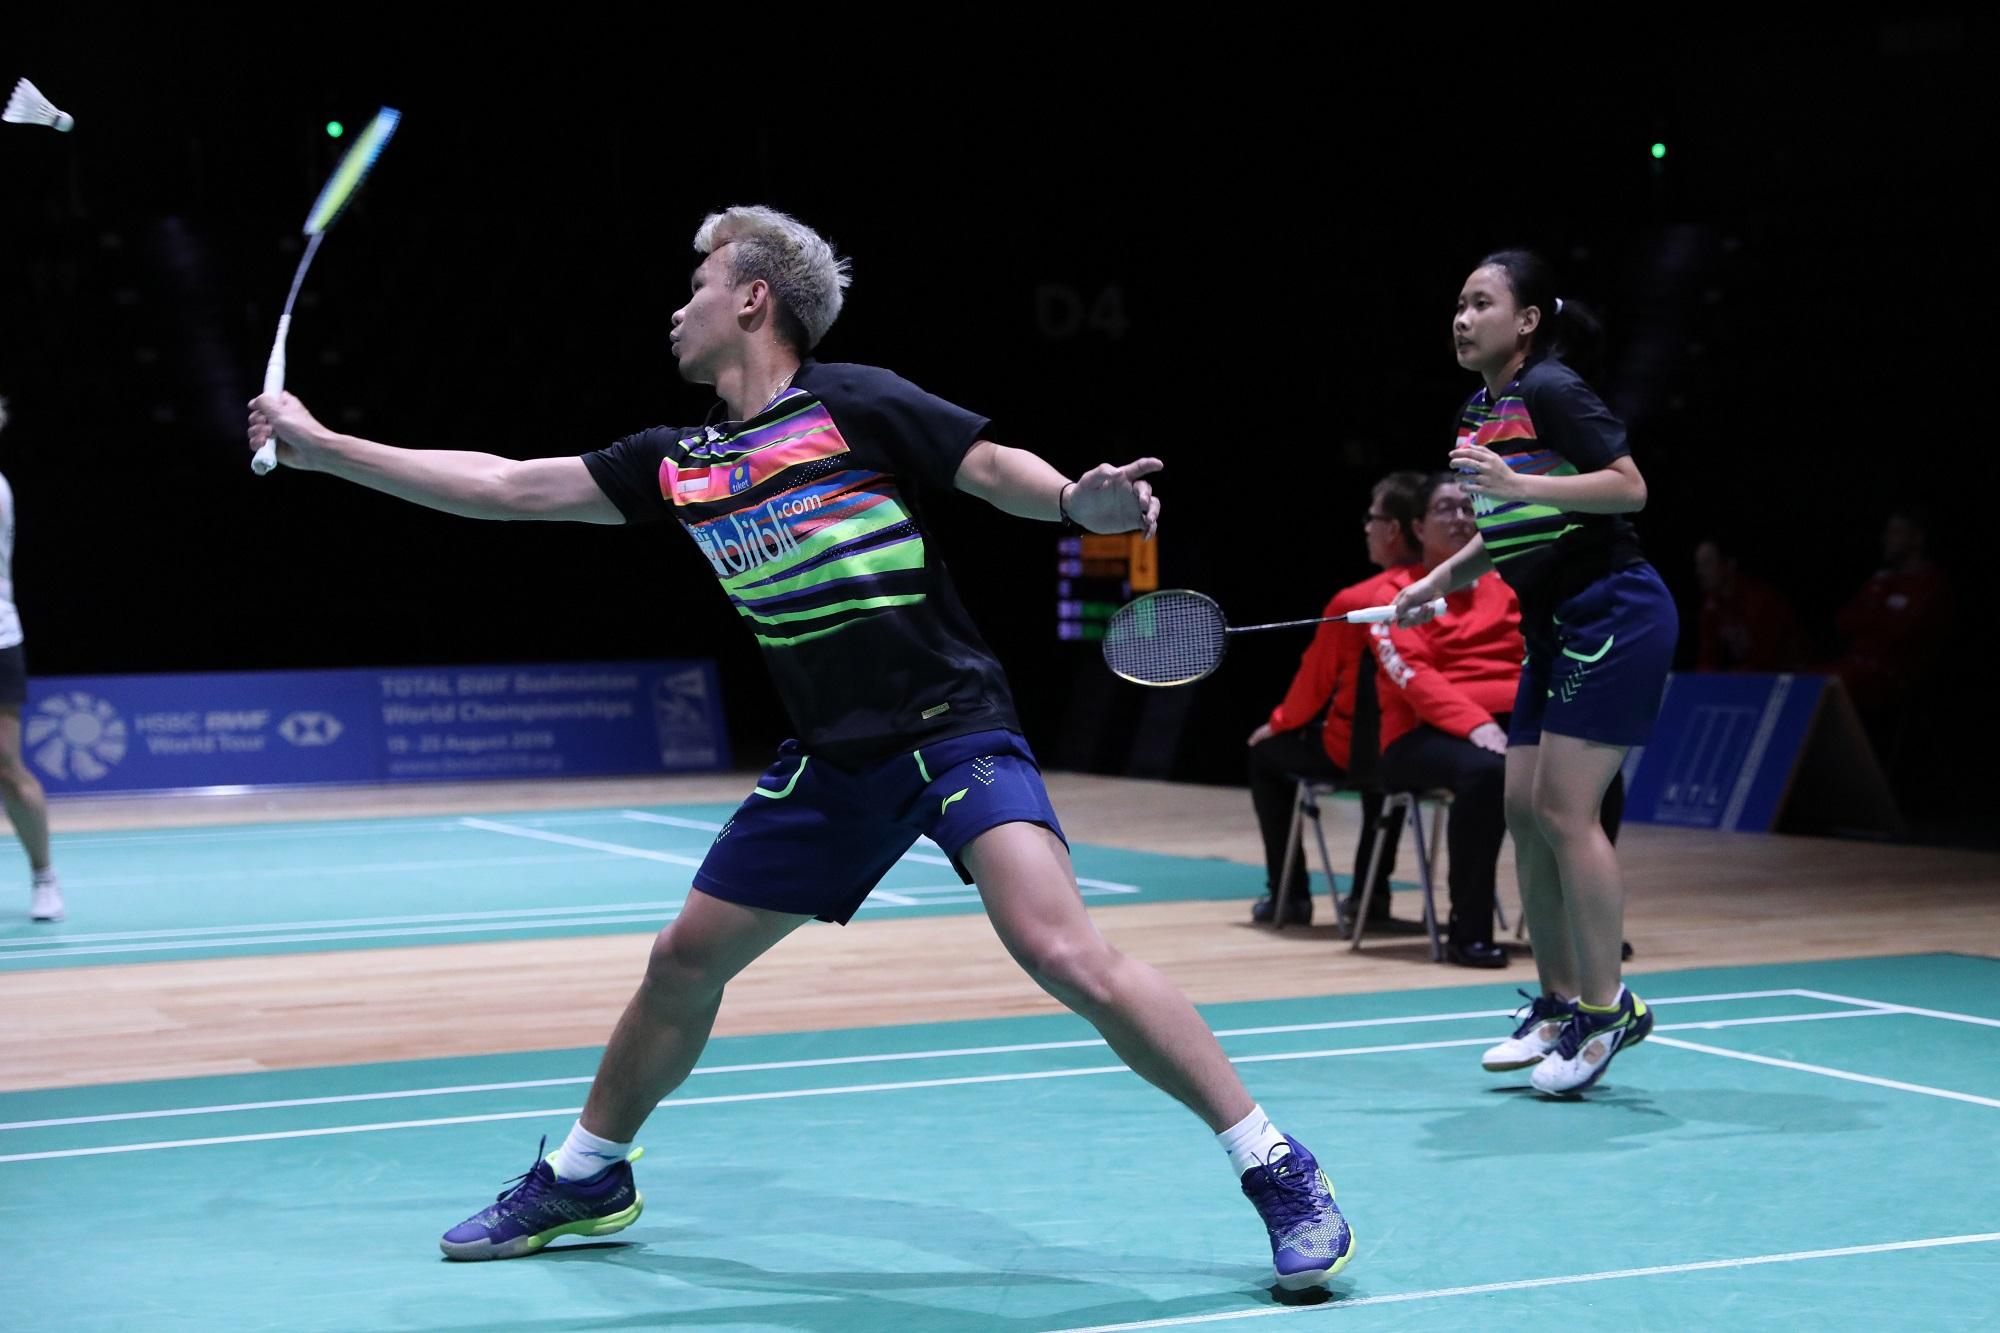 https: img-z.okeinfo.net content 2019 09 27 40 2109897 jadwal-wakil-indonesia-di-perempatfinal-korea-open-2019-ZmKmBz80o9.jpg